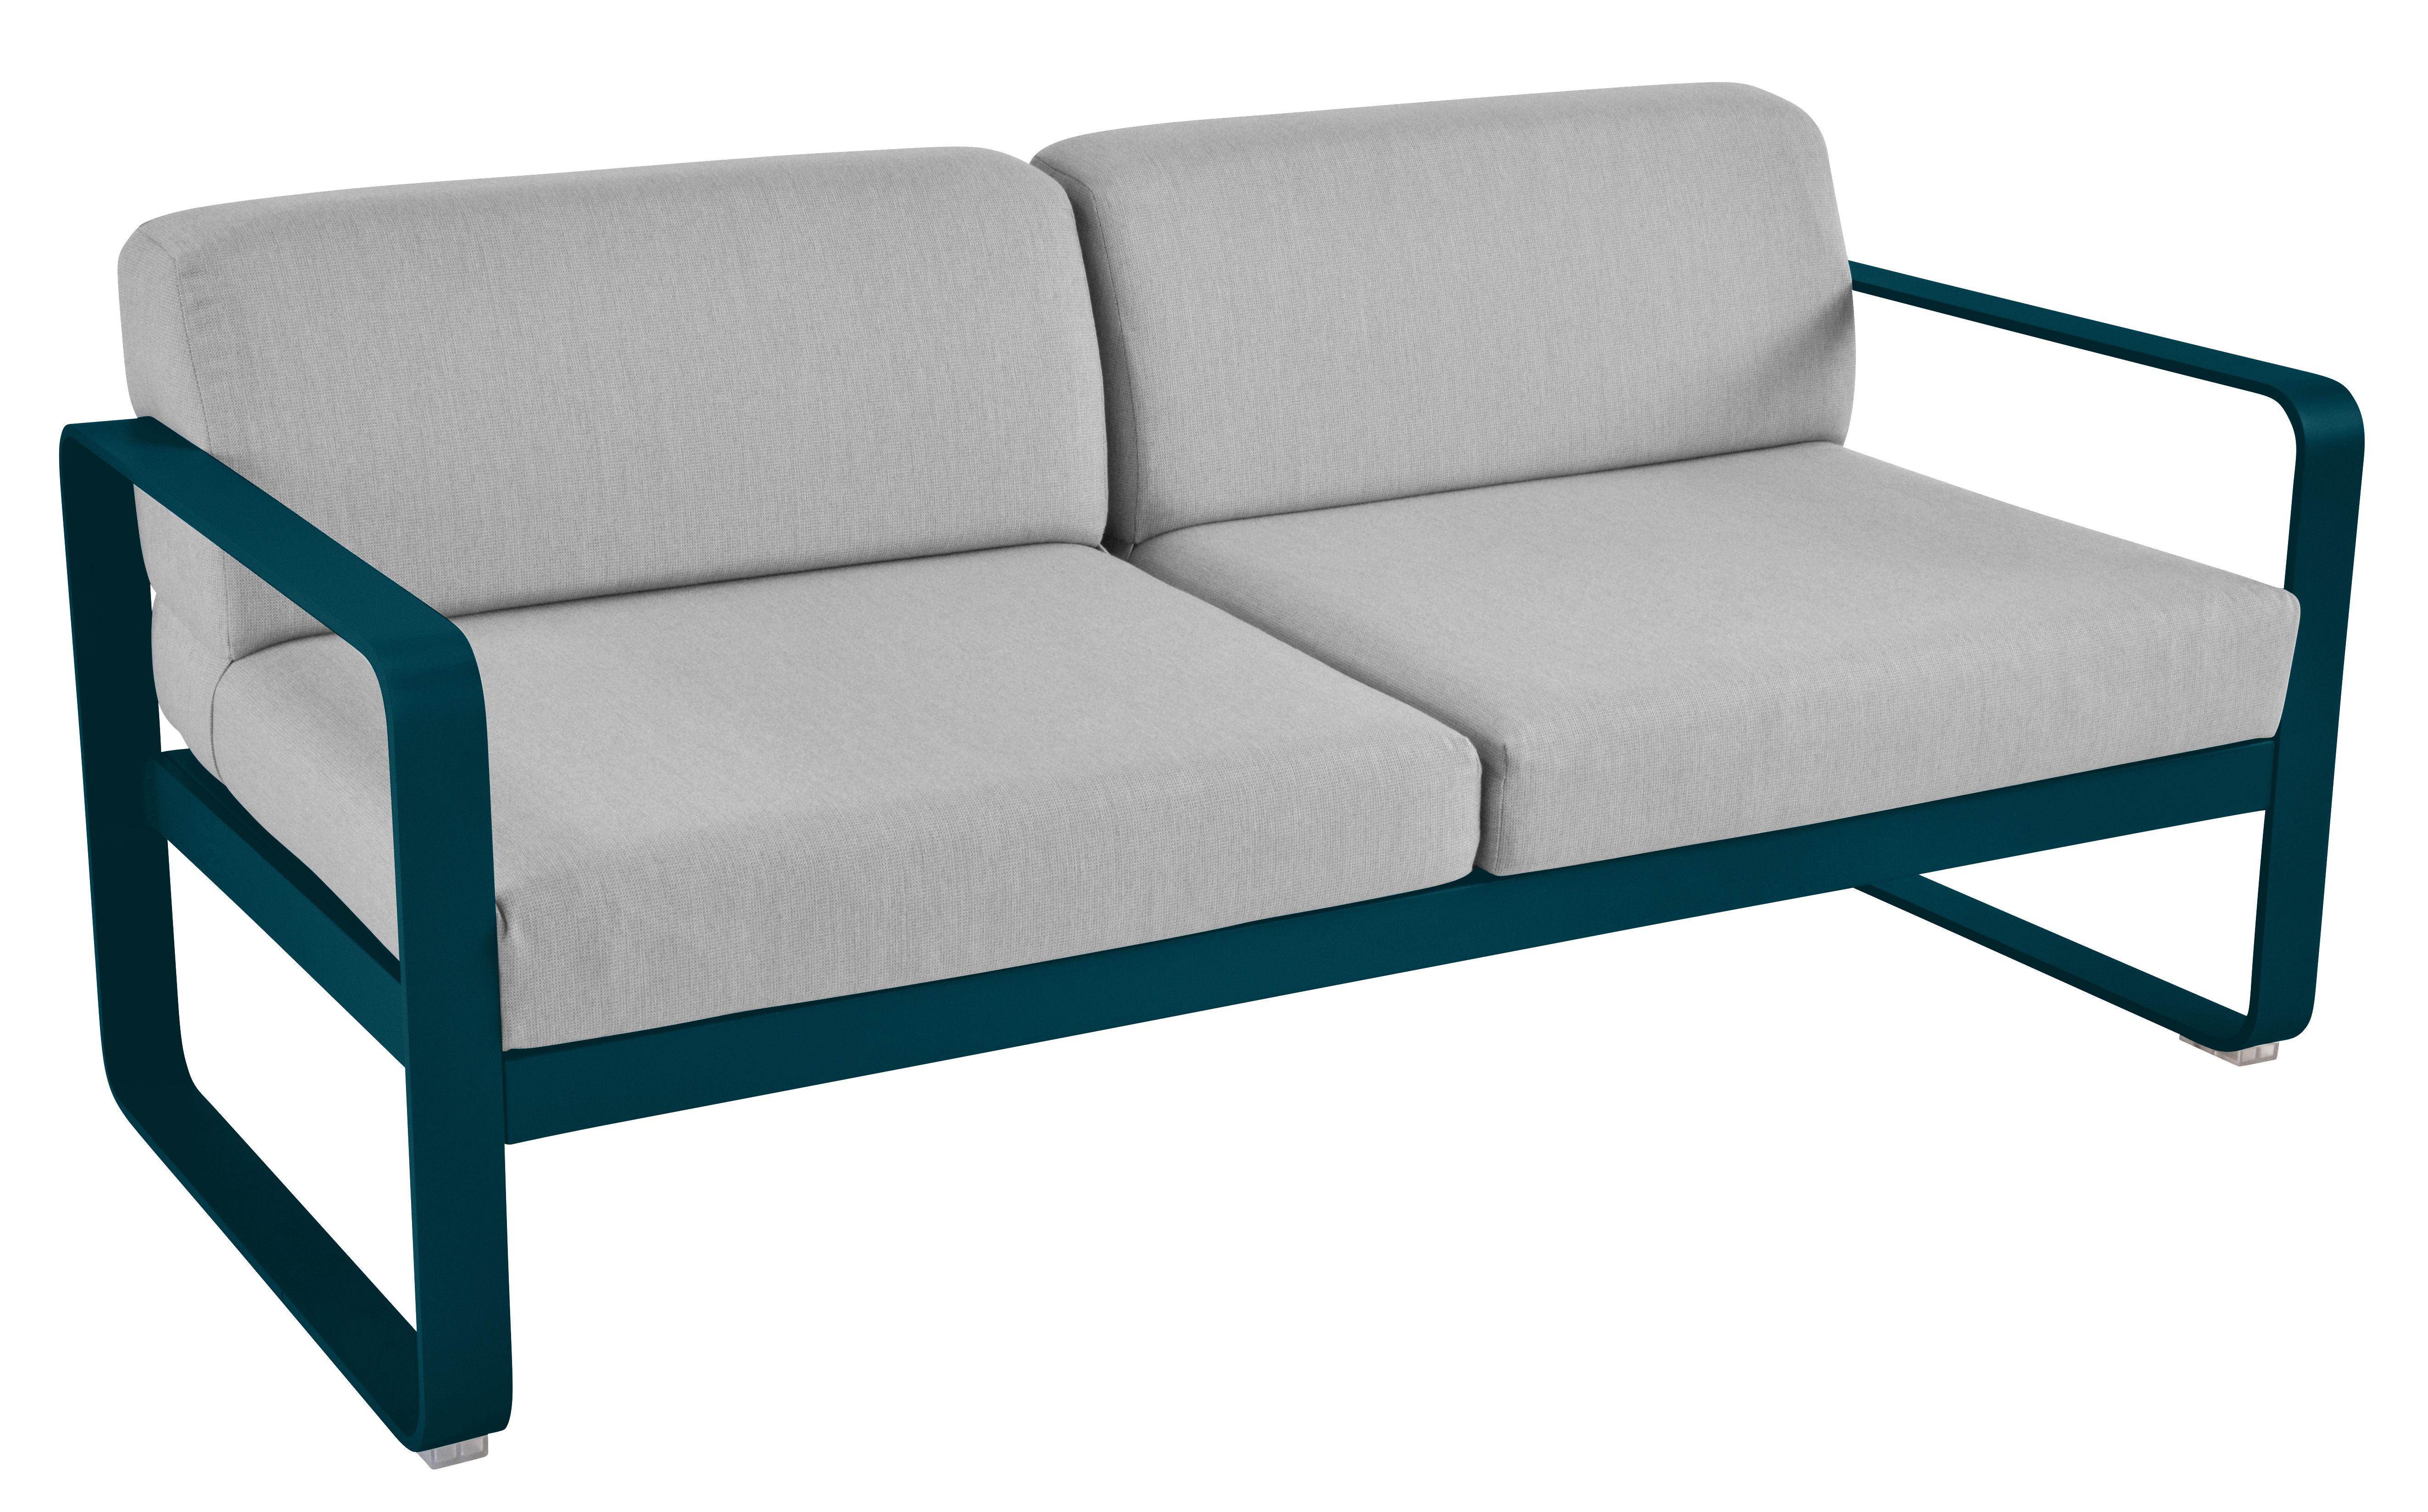 Möbel - Sofas - Bellevie Sofa 2-Sitzer / L 160 cm - Bezug grau - Fermob - Acapulcoblau / Stoffbezug flanellgrau - lackiertes Aluminium, Polyacryl-Gewebe, Schaumstoff